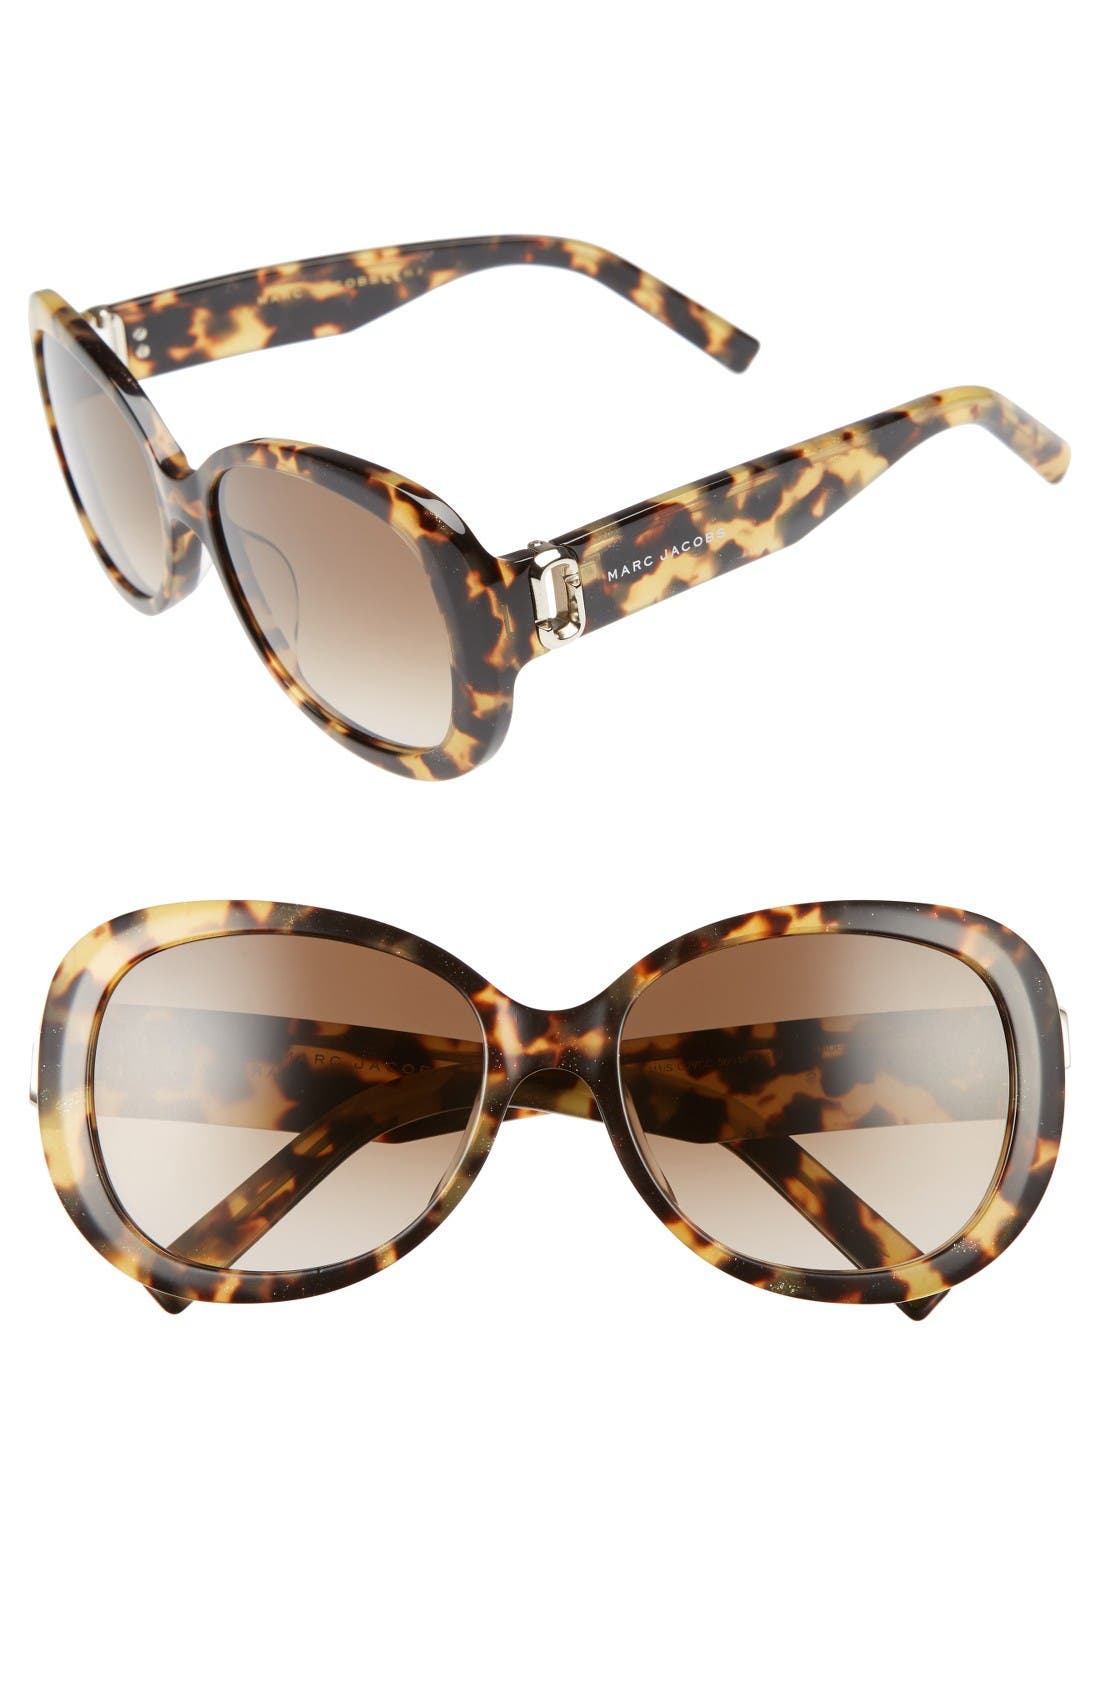 Main Image - MARC JACOBS 56mm Sunglasses